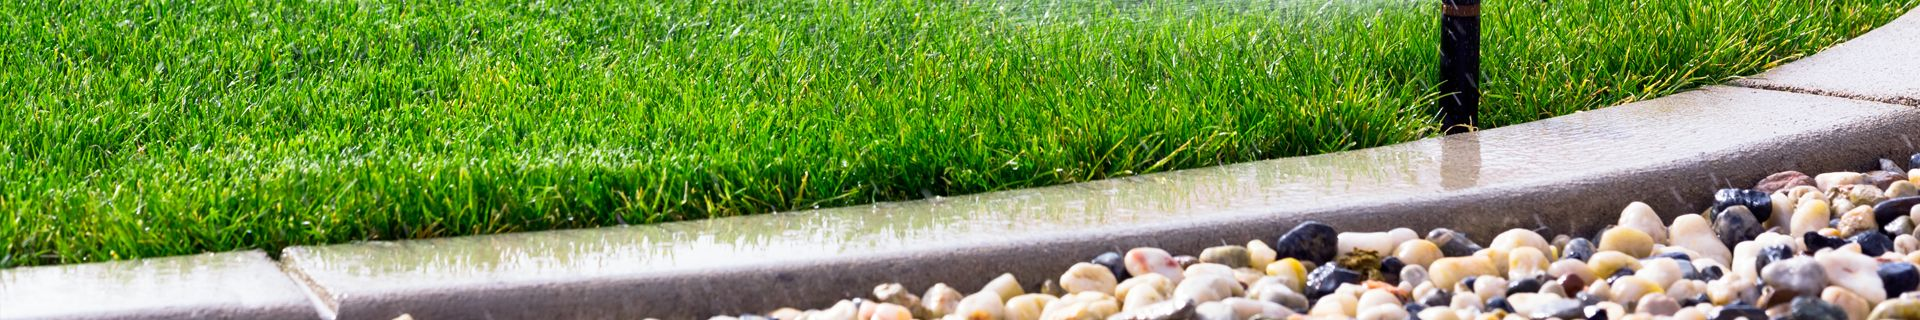 A water sprinkler watering grass lawn.